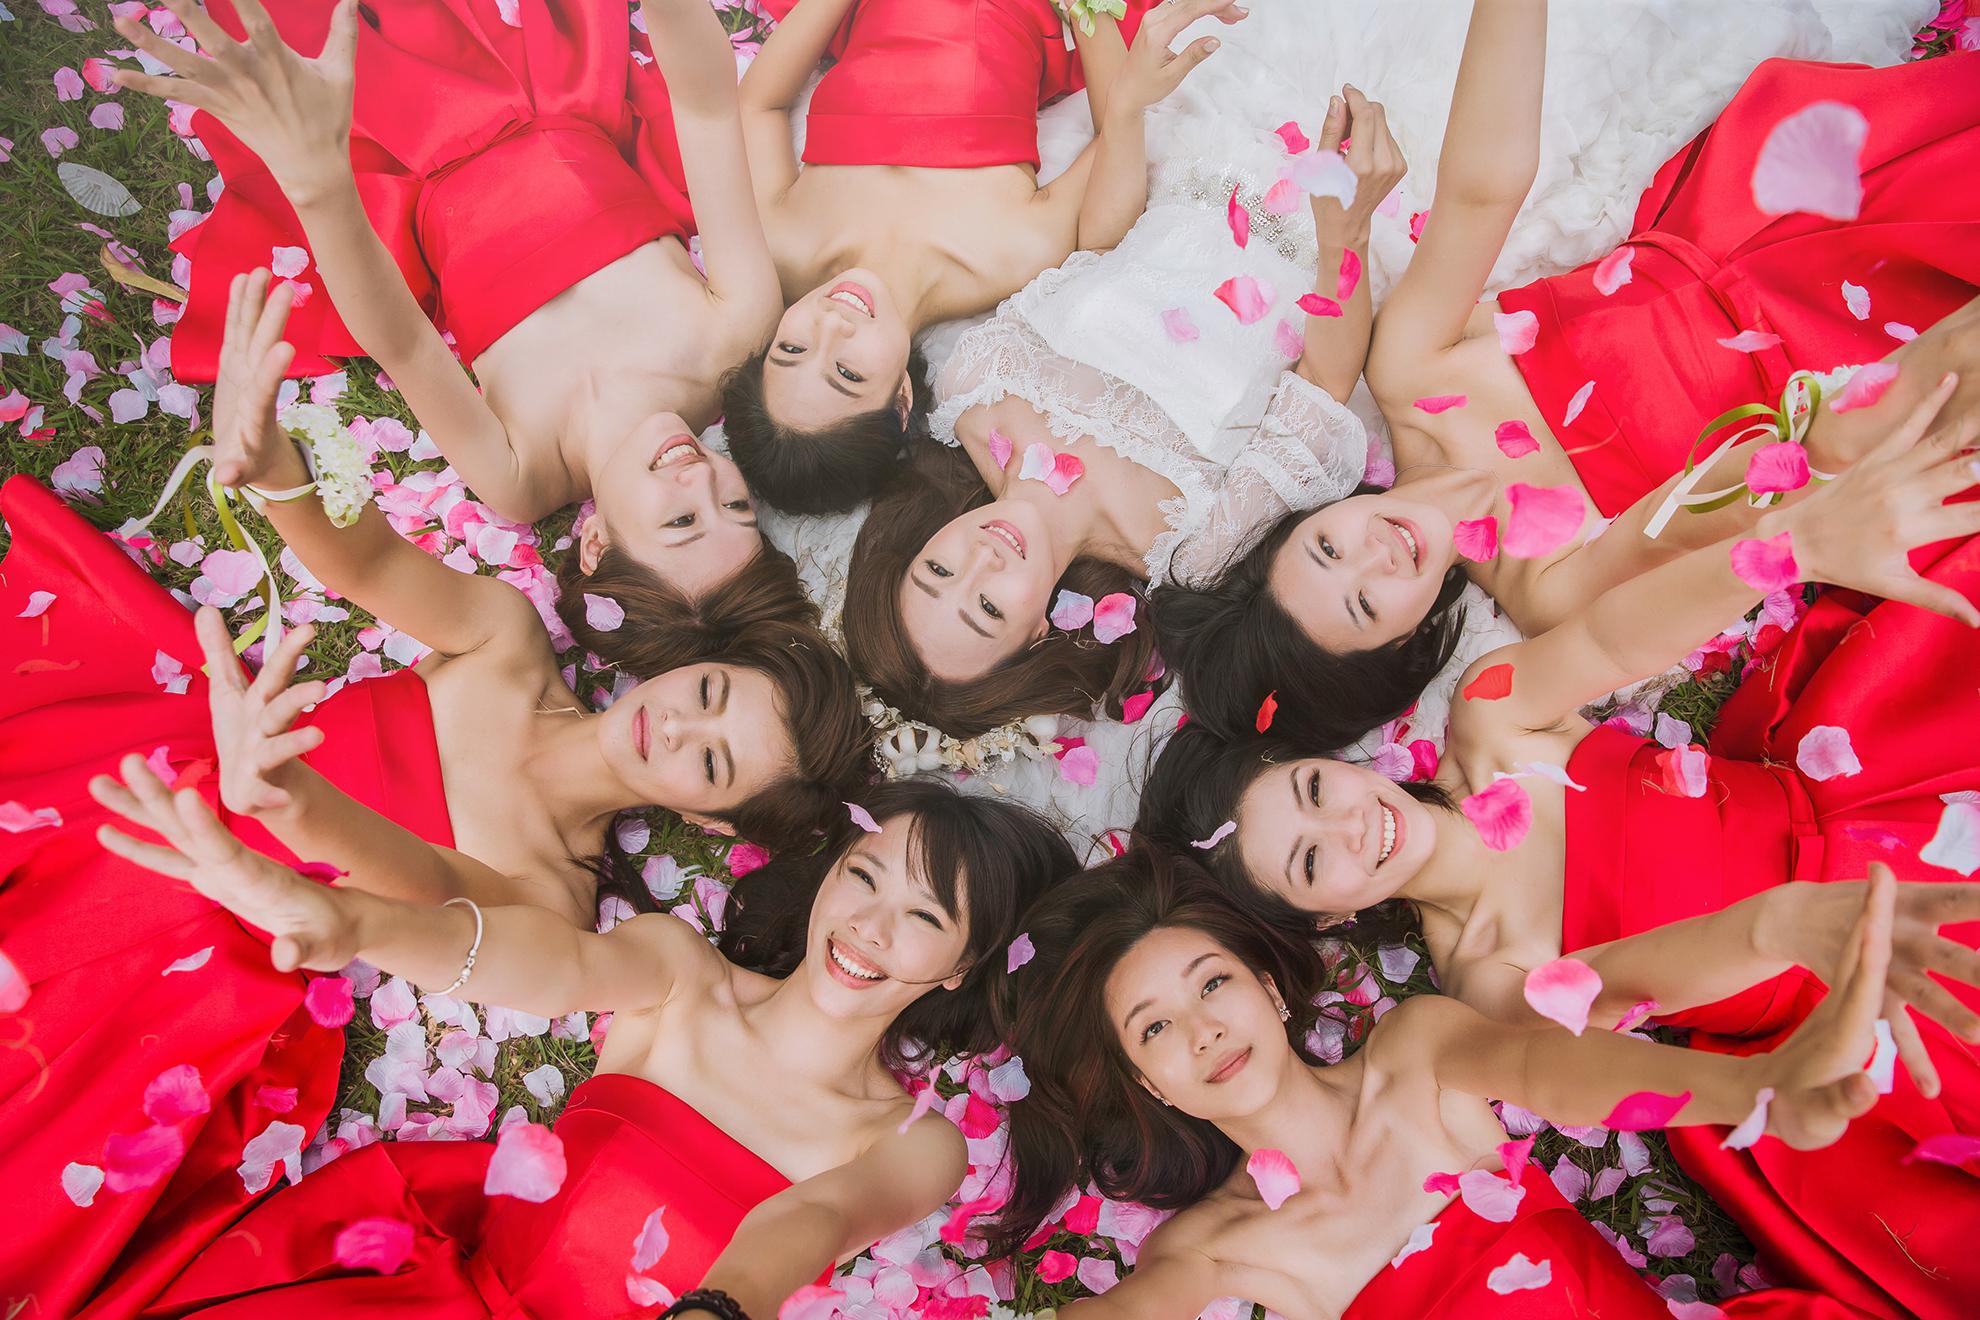 HOME  | 婚攝 Vincent - 峇里島婚禮, 峇里島婚攝, 巴里島婚禮, 巴里島婚礼, Bali Wedding, The Ritz-Carlton, Bali, 美式婚禮, American Style Wedding, 海外婚紗婚攝 | 婚禮攝影 | 婚攝推薦, 婚攝, 婚禮紀錄, 婚禮攝影, 婚禮紀錄, 婚攝Vincent, 婚禮紀錄, 婚紗攝影, 婚禮攝影推薦, 孕婦寫真, 自助婚紗, 新生兒寫真, 日本婚禮攝影, 海外婚禮攝影, 婚紗攝影, 海島婚禮, 峇里島婚禮, 風雲20攝影師, 寒舍艾美, 東方文華, 君悅酒店, W HotelHOME  | 婚攝 Vincent, 峇里島婚禮, 峇里島婚攝, 巴里島婚禮, 巴里島婚礼, Bali Wedding, The Ritz-Carlton, Bali, 美式婚禮, American Style Wedding, 海外婚紗婚攝, 婚禮攝影, 婚攝推薦, 婚攝, 婚禮紀錄, 婚禮攝影, 婚禮紀錄, 婚攝Vincent, 婚禮紀錄, 婚紗攝影, 婚禮攝影推薦, 孕婦寫真, 自助婚紗, 新生兒寫真, 日本婚禮攝影, 海外婚禮攝影, 婚紗攝影, 海島婚禮, 峇里島婚禮, 風雲20攝影師, 寒舍艾美, LE MERIDIEN TAIPEI, 台北寒舍艾美, 東方文華, 君悅酒店, W Hotel, 萬豪酒店, 台北萬豪酒店, 婚攝 推薦